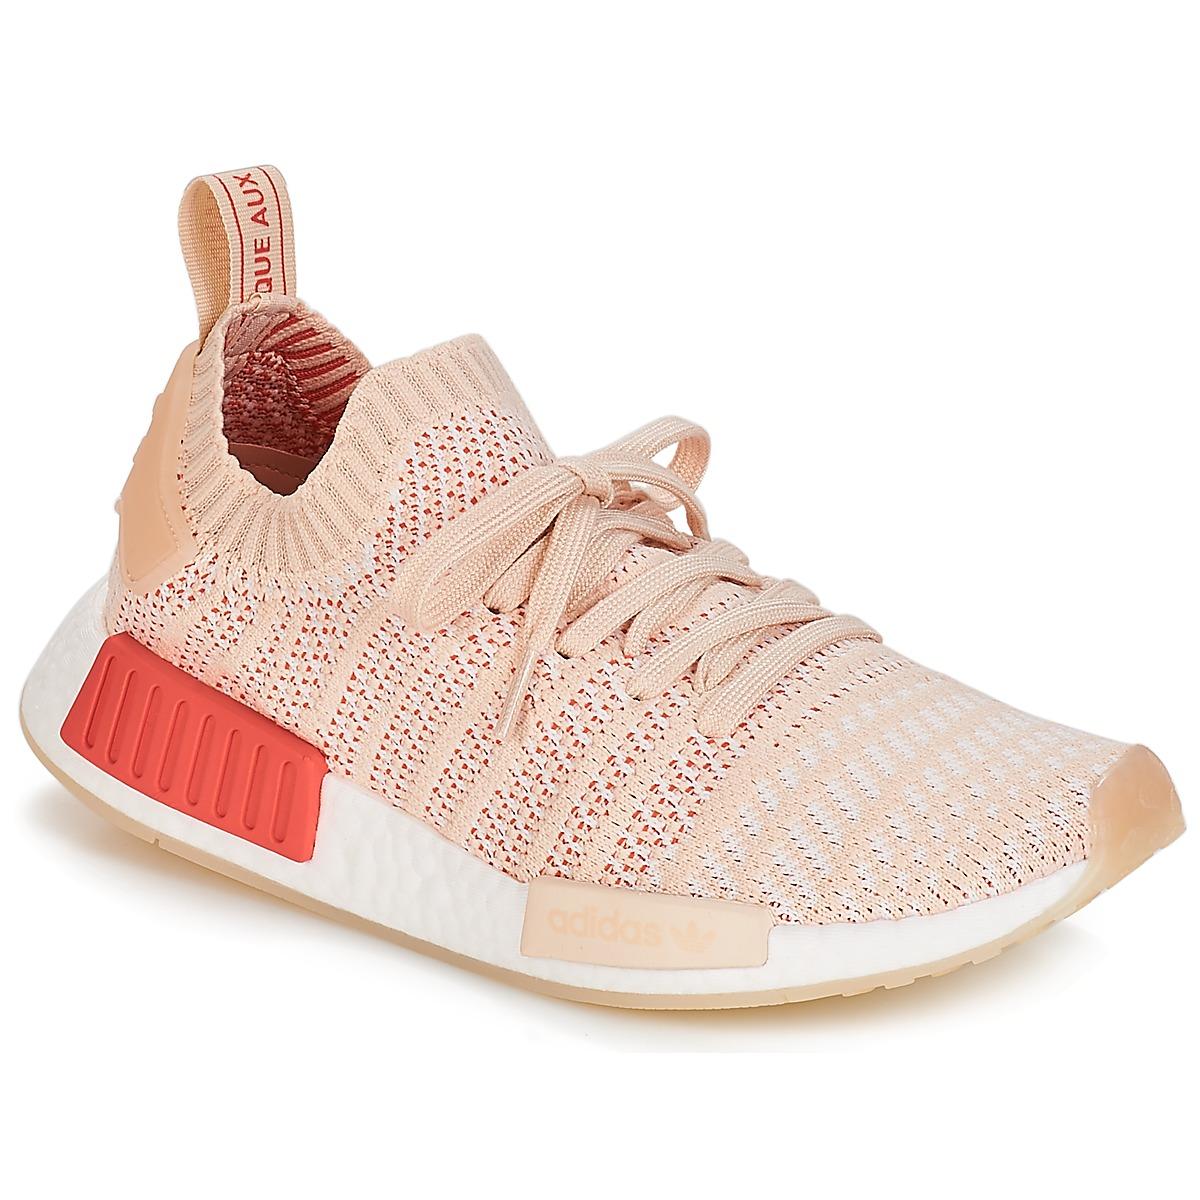 adidas Originals NMD R1 STLT PK W Weiss - Kostenloser Versand bei Spartoode ! - Schuhe Sneaker Low Damen 179,95 €